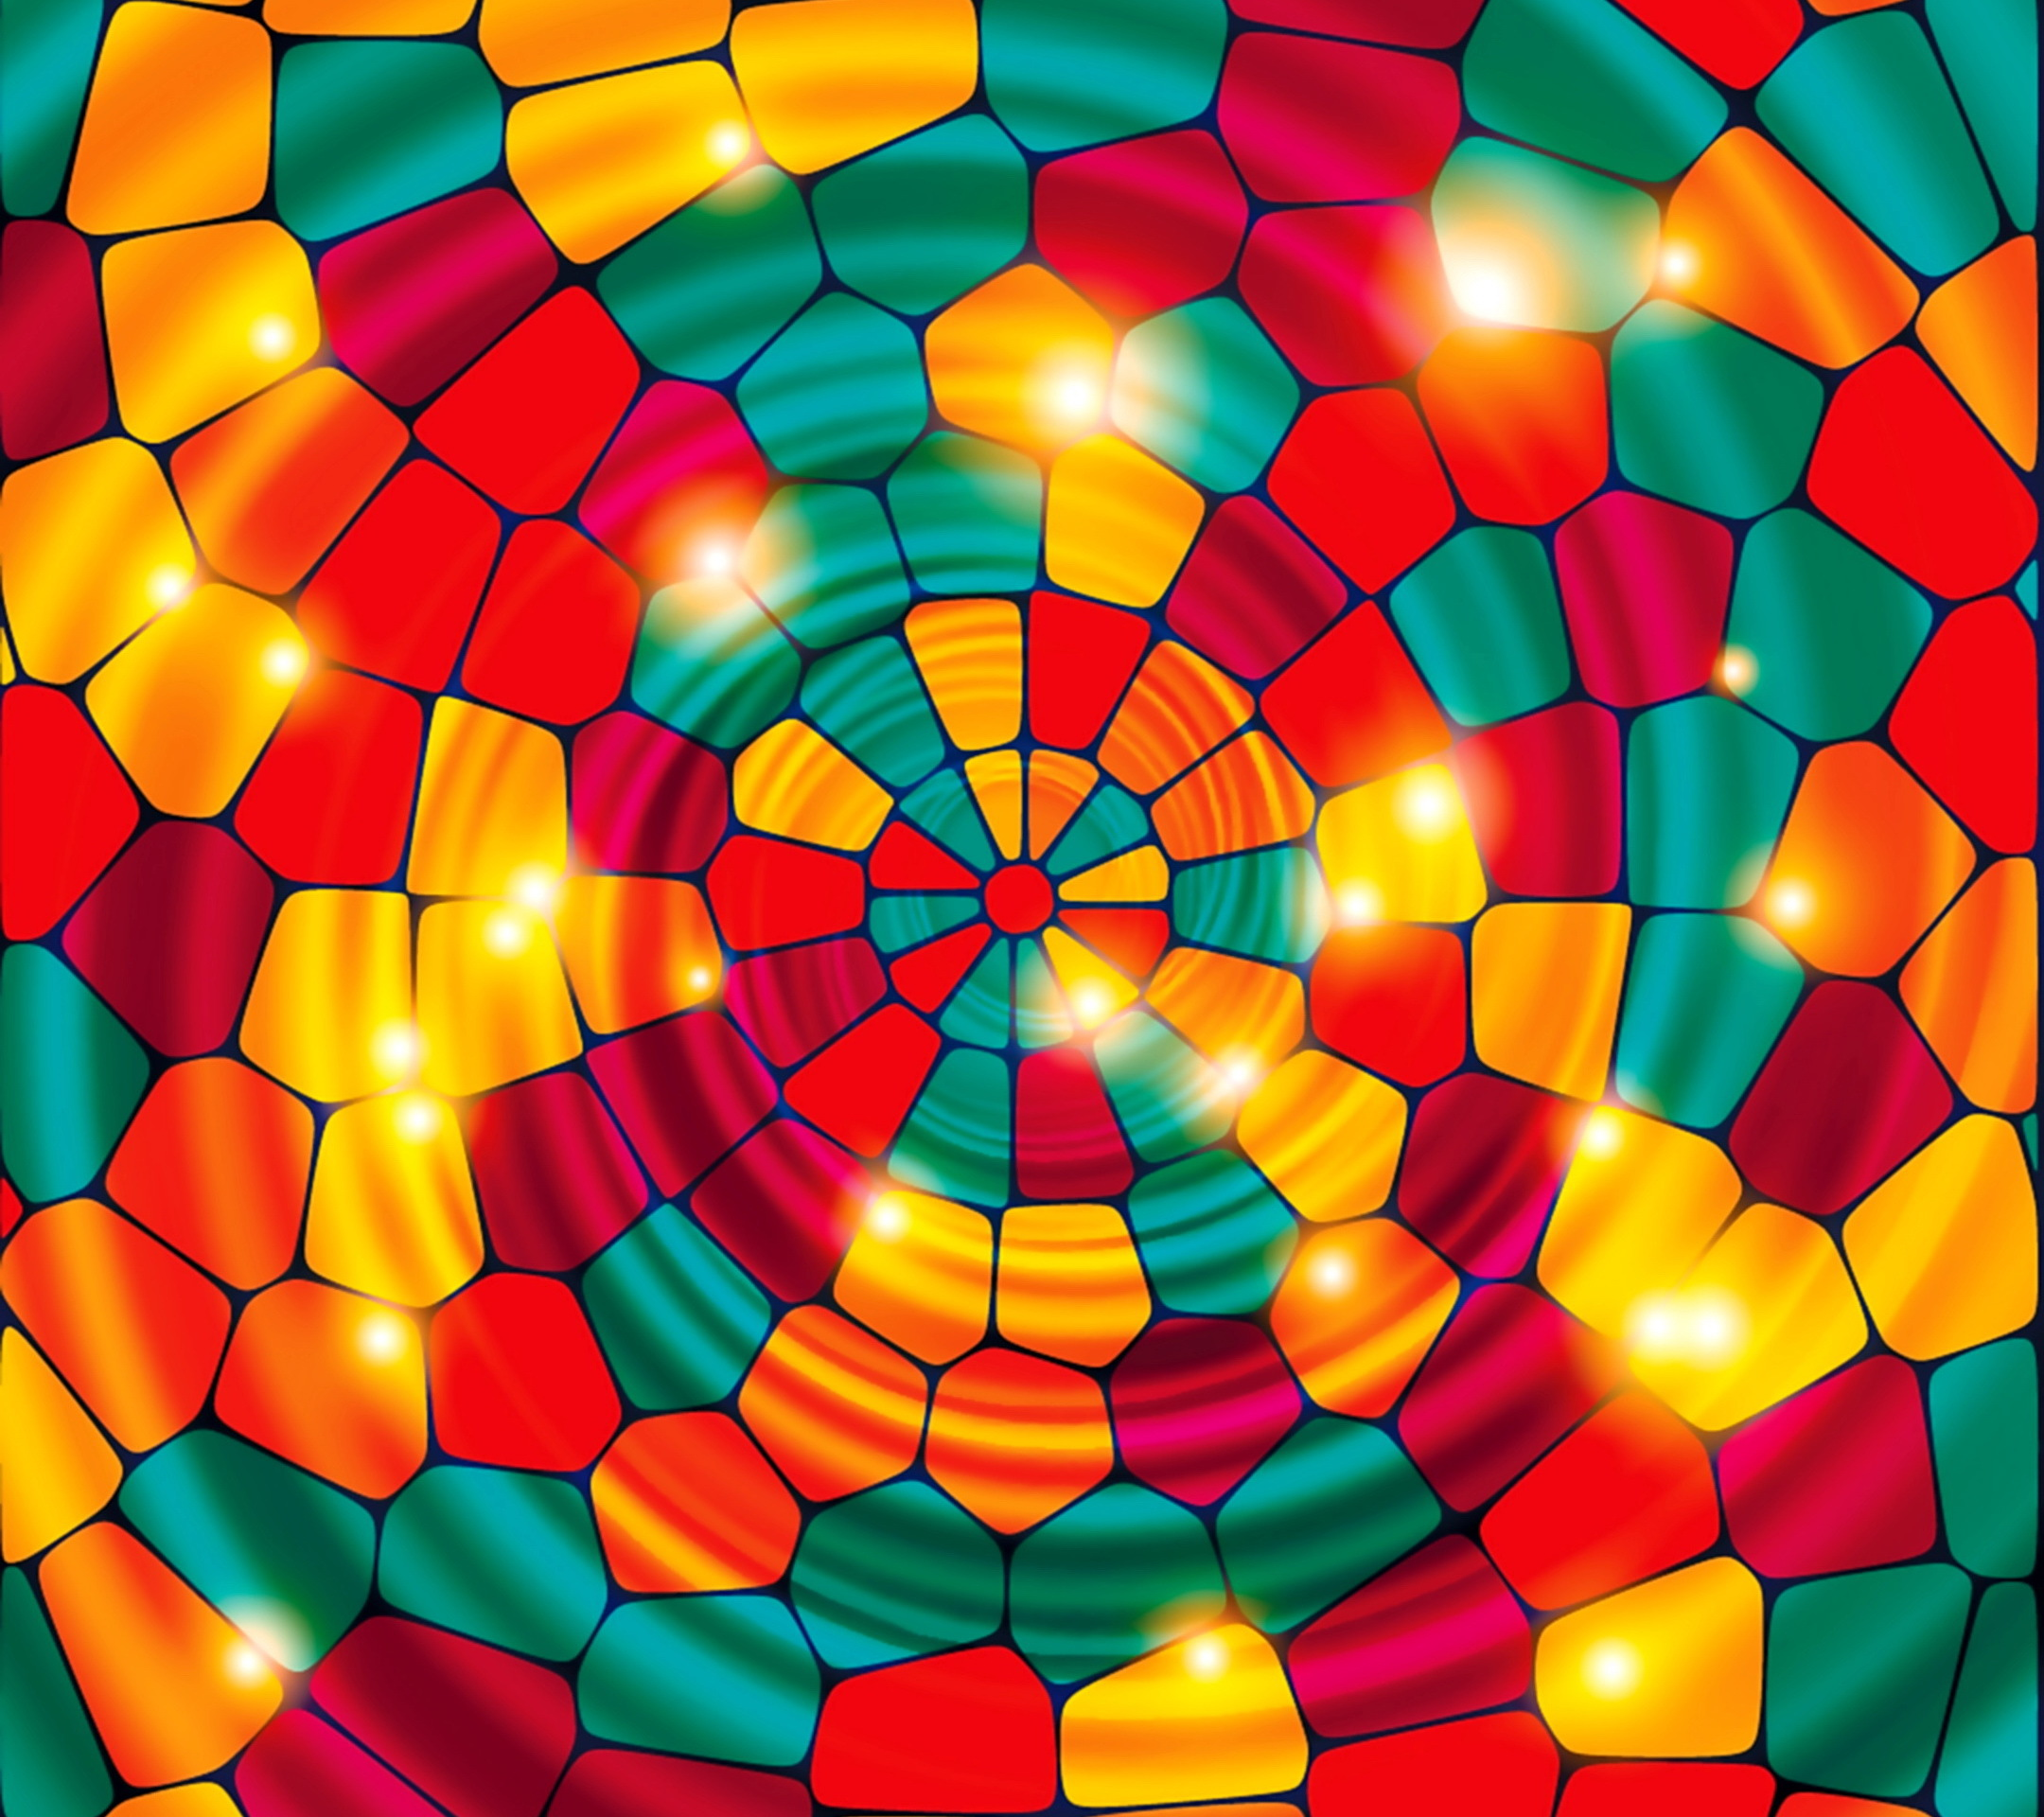 Картинка с мозаикой